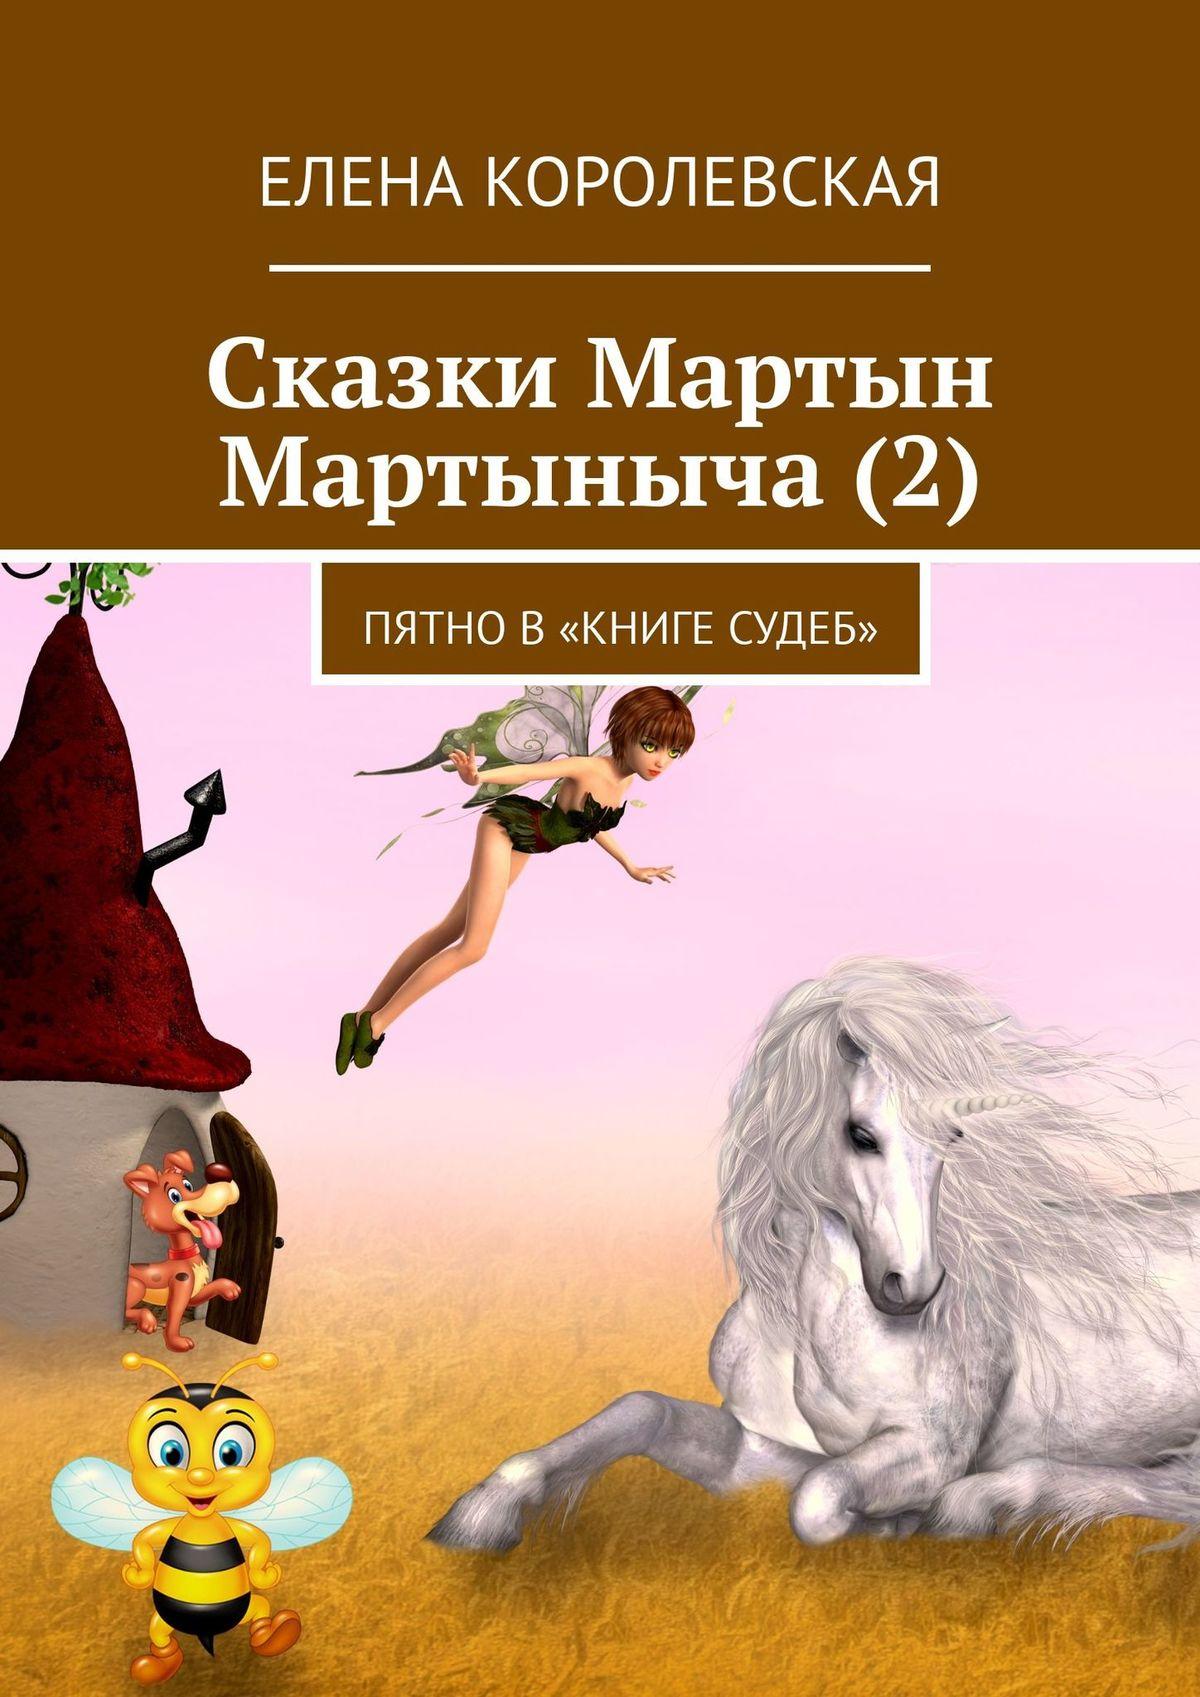 Сказки Мартын Мартыныча(2). Пятно в «Книге судеб»